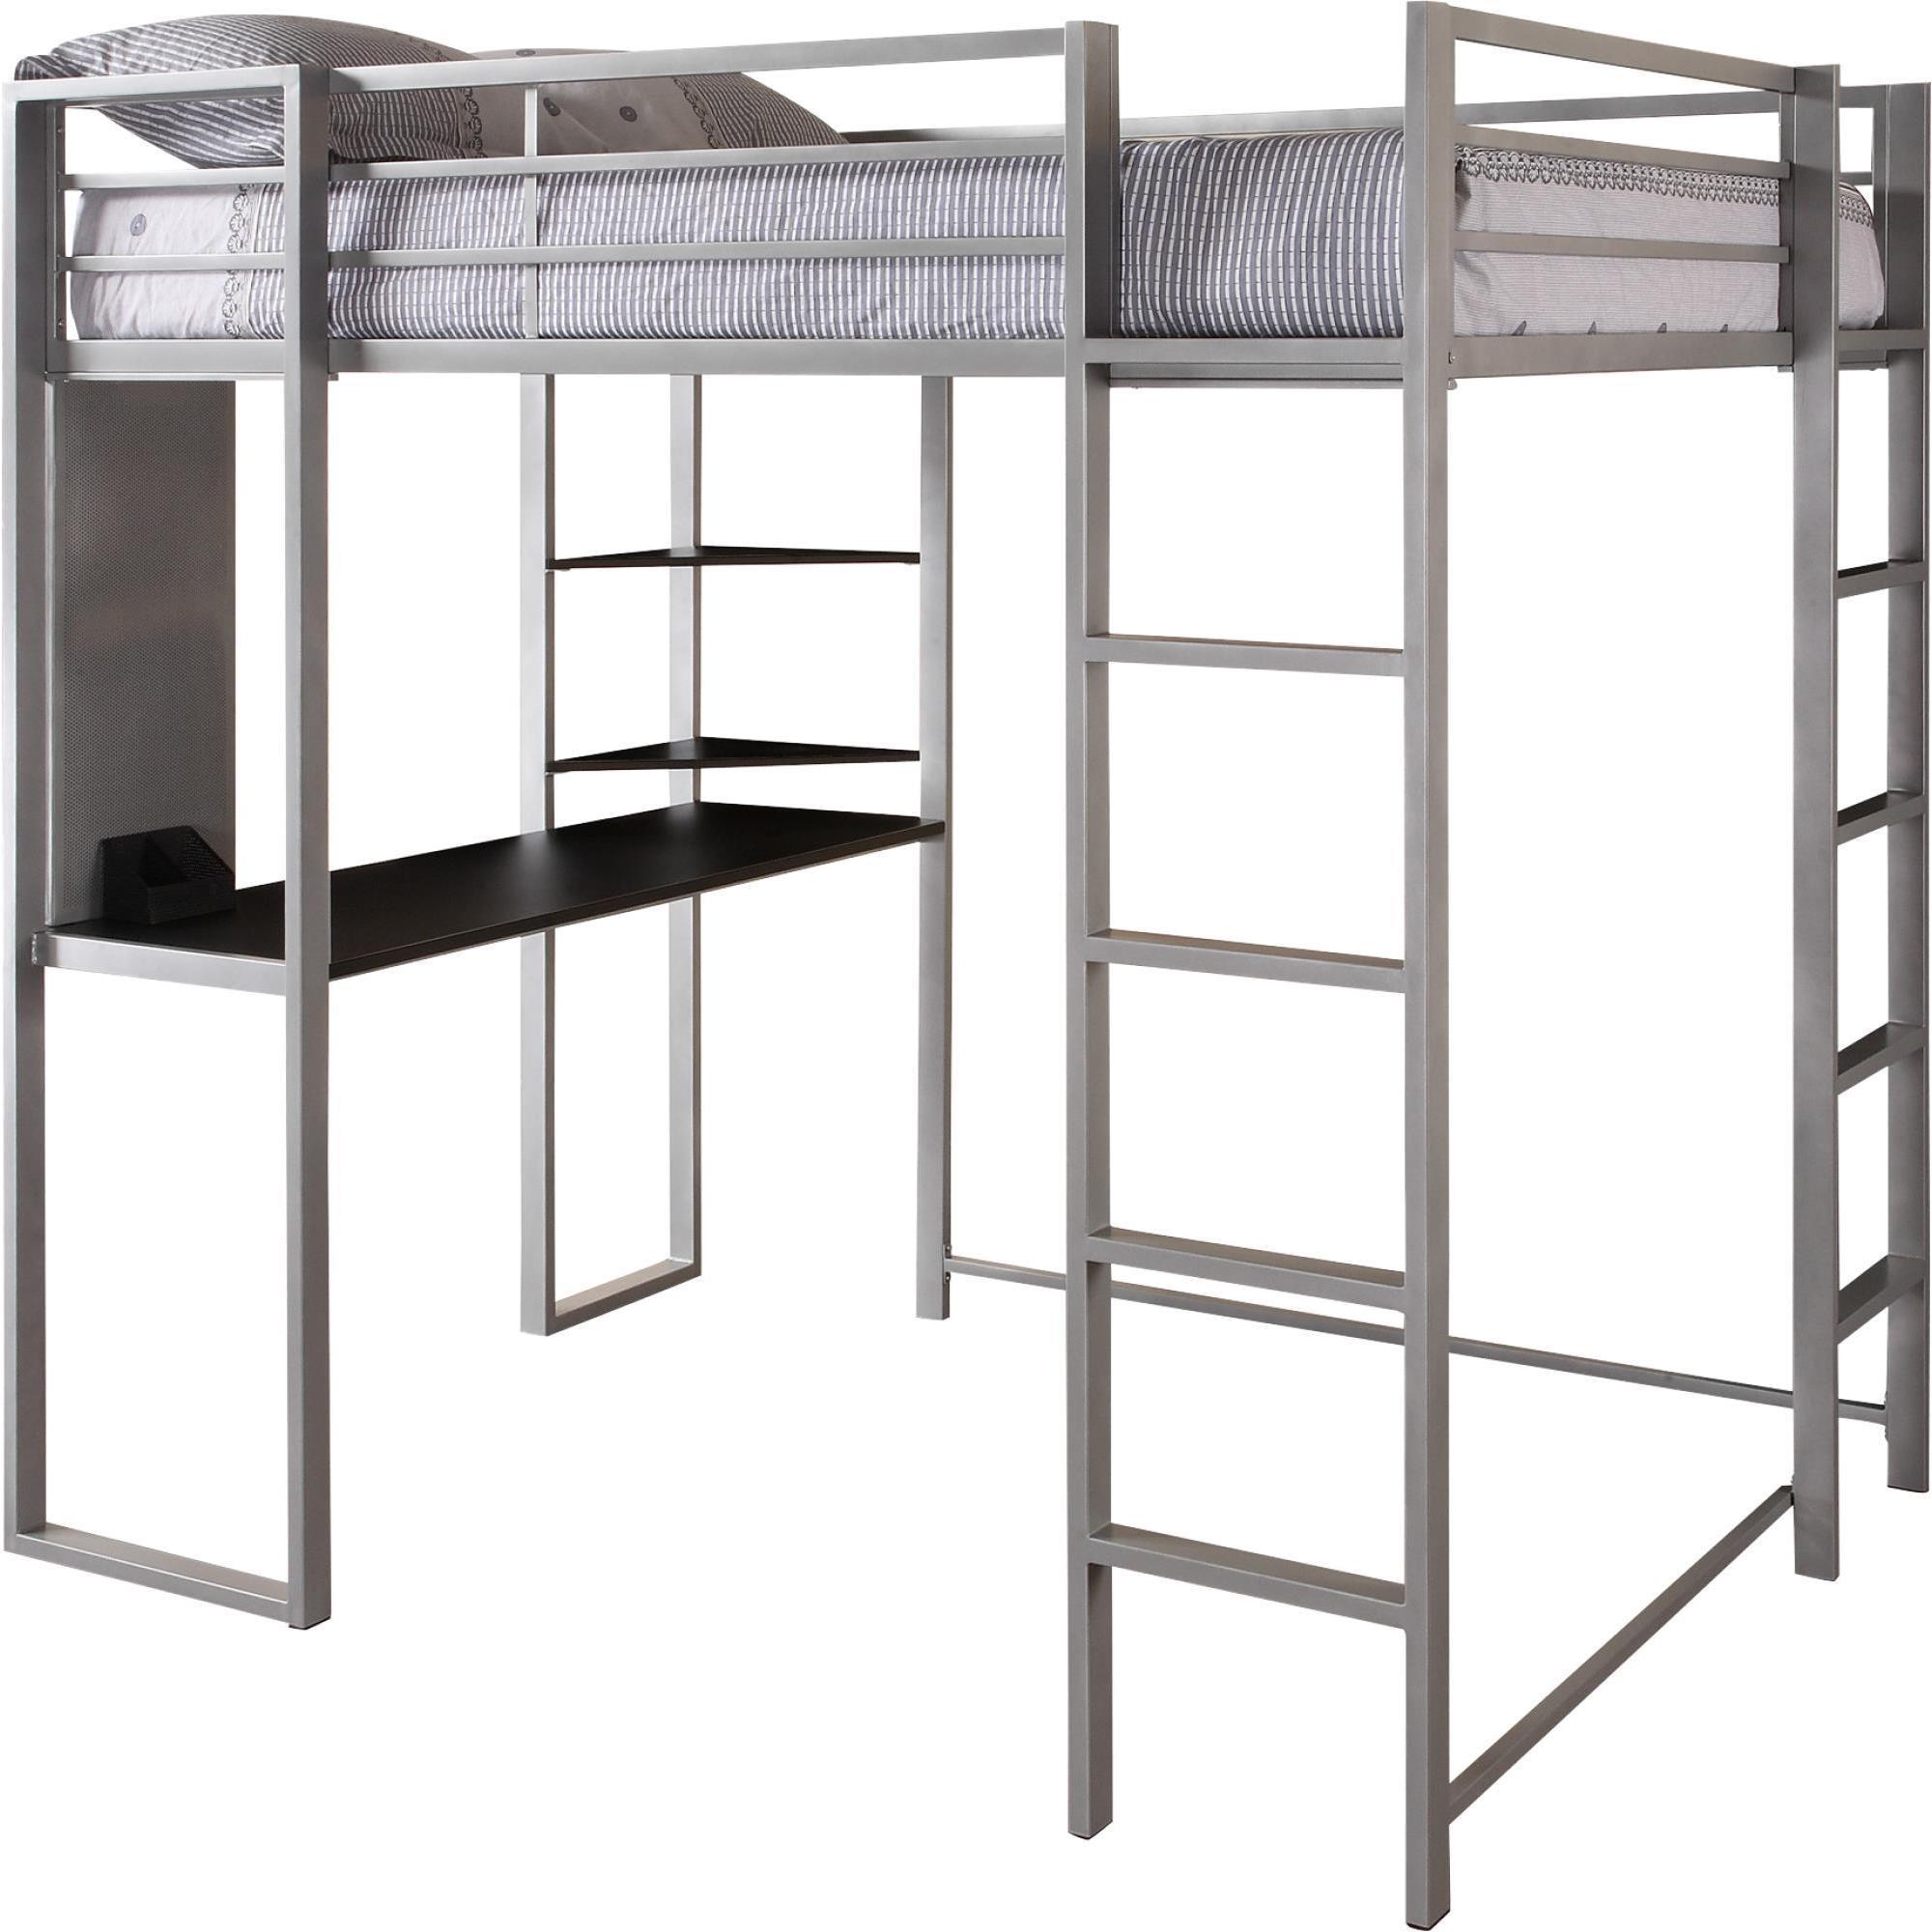 DHP Abode Full Size Metal Loft Bed (Abode Full Size Loft ...